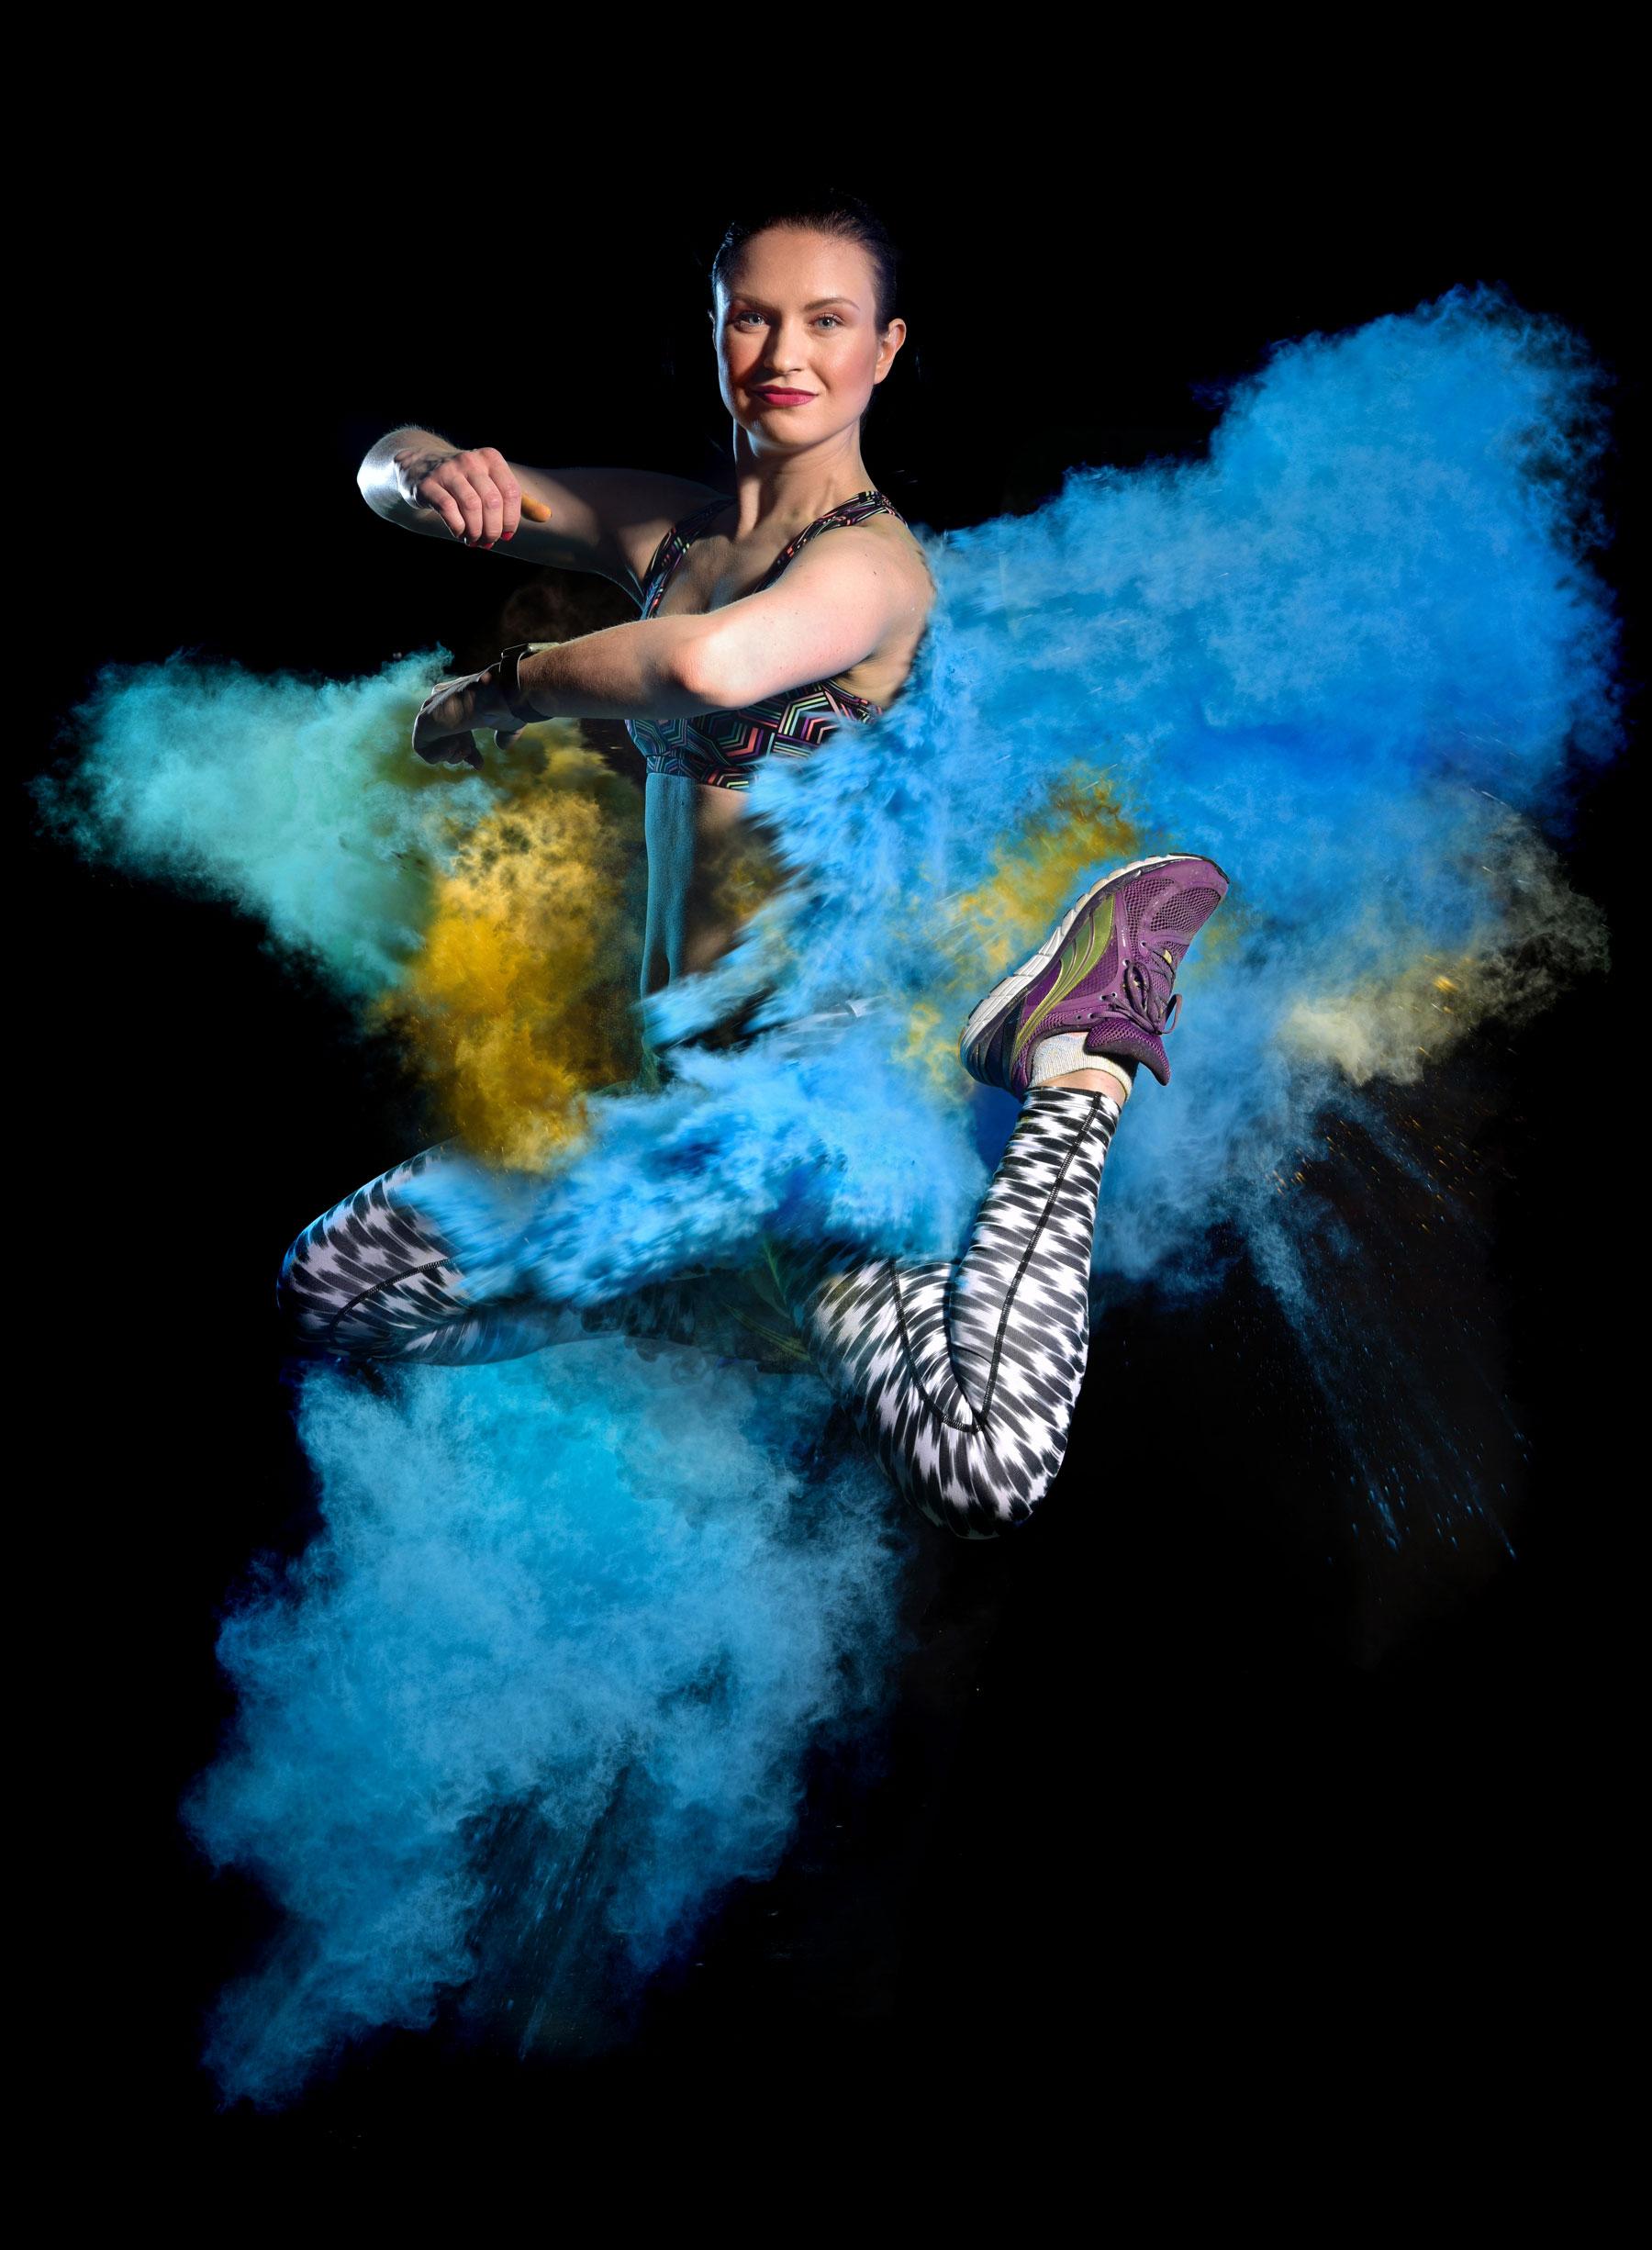 advertising-commercial-powder-shoot-sports-photography-brandon-barnard-professional-photographer.jpg